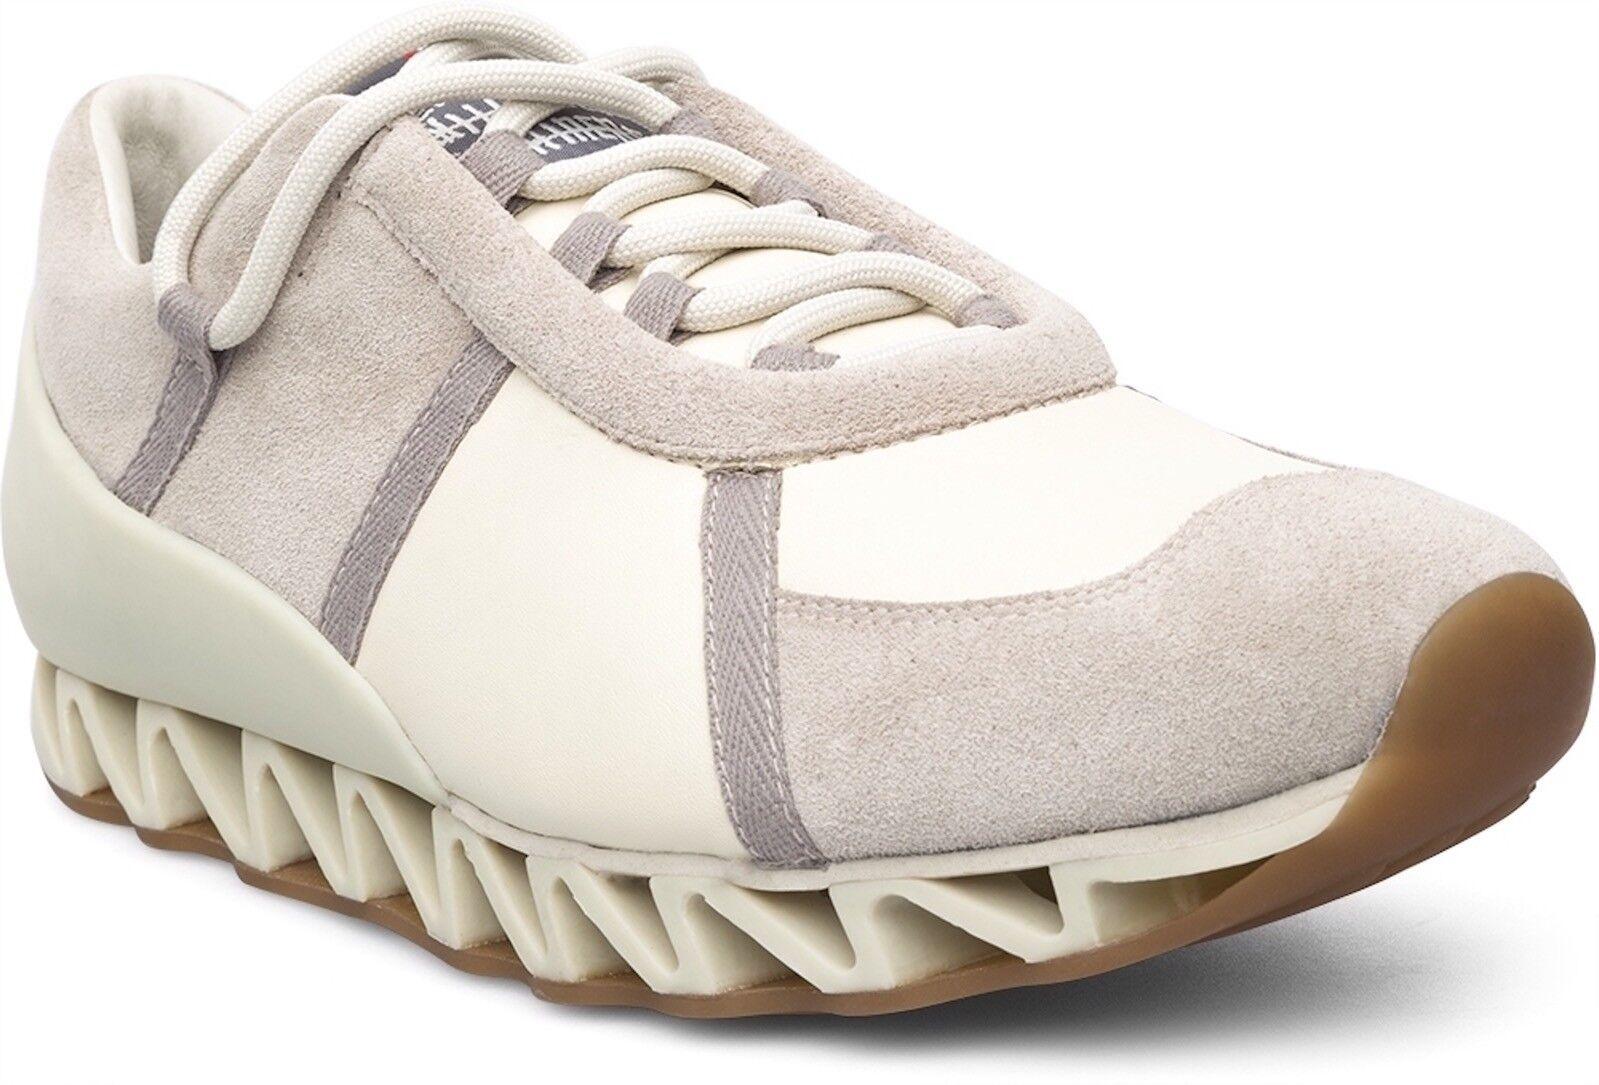 280 Bernhard Willhelm Camper US 11 EU 44 44 44 Together Himalayan scarpe Uomo 18885-004 773a99